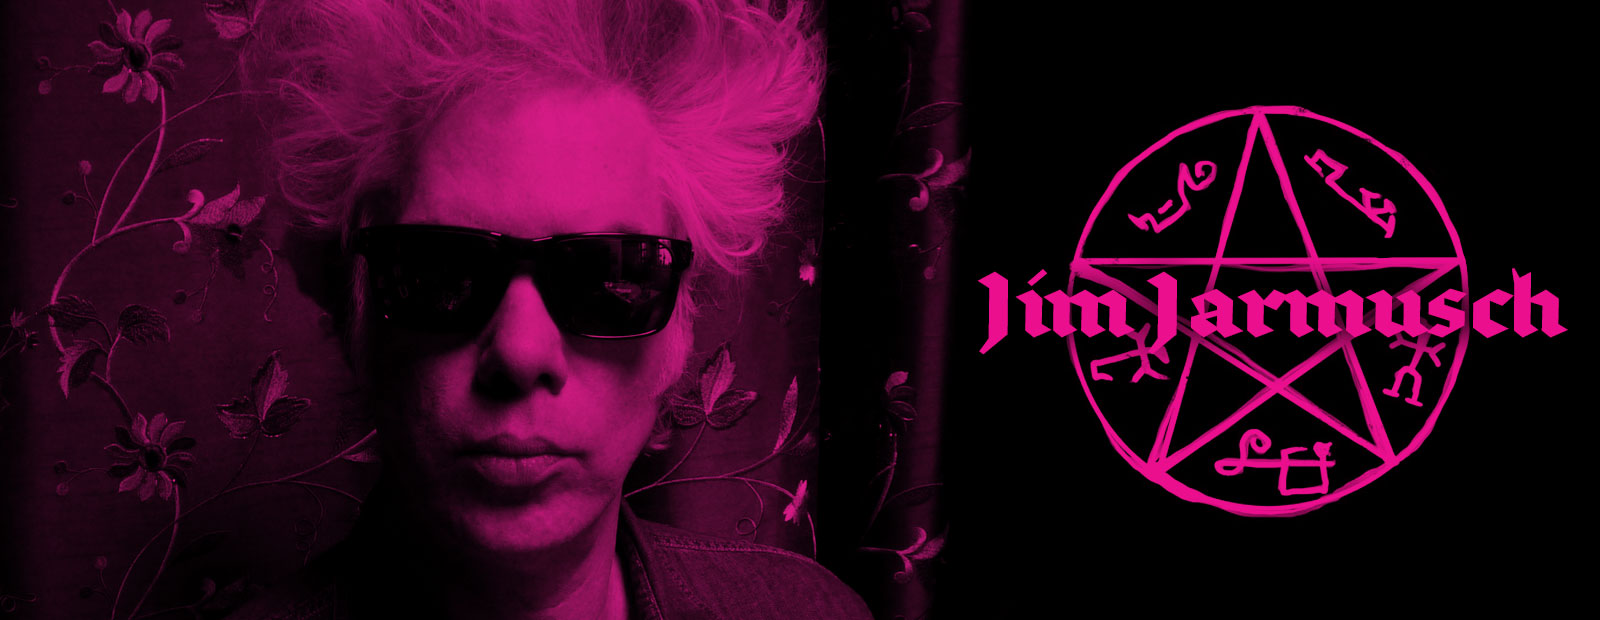 Jim Jarmusch Blog Heading